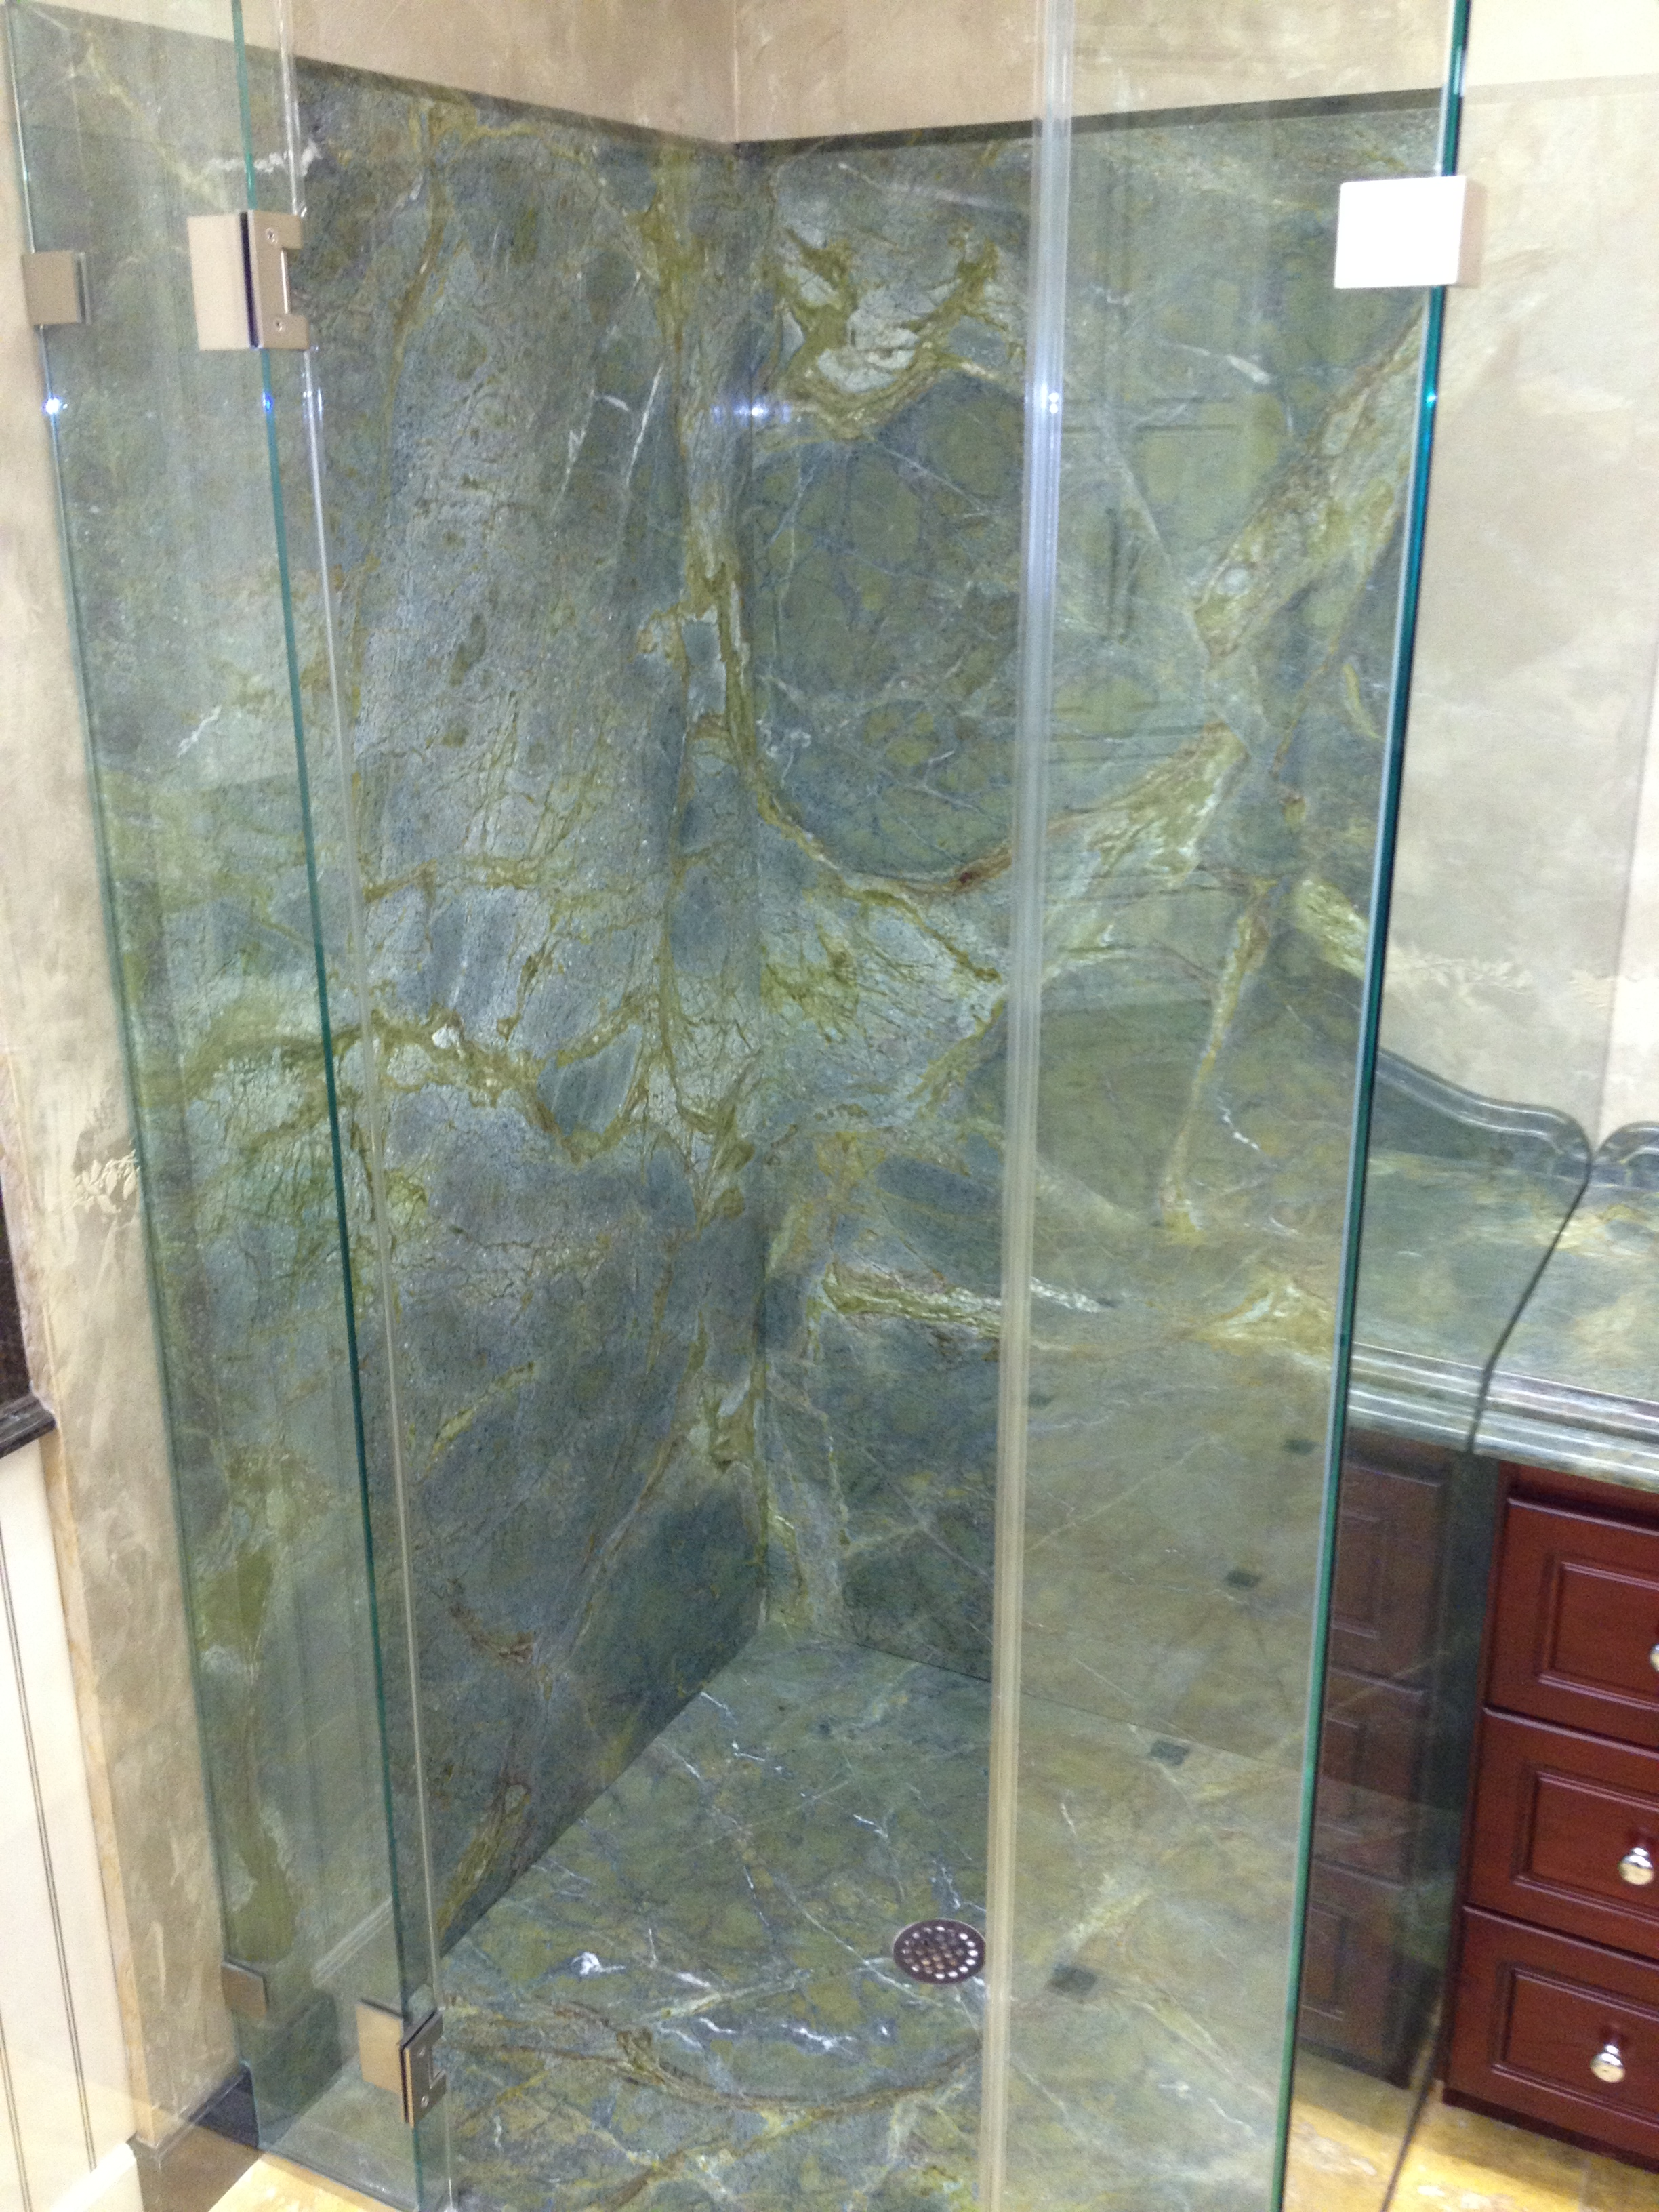 Exceptionnel Shower Walls And Floor In Verde Vecchio Quartzite